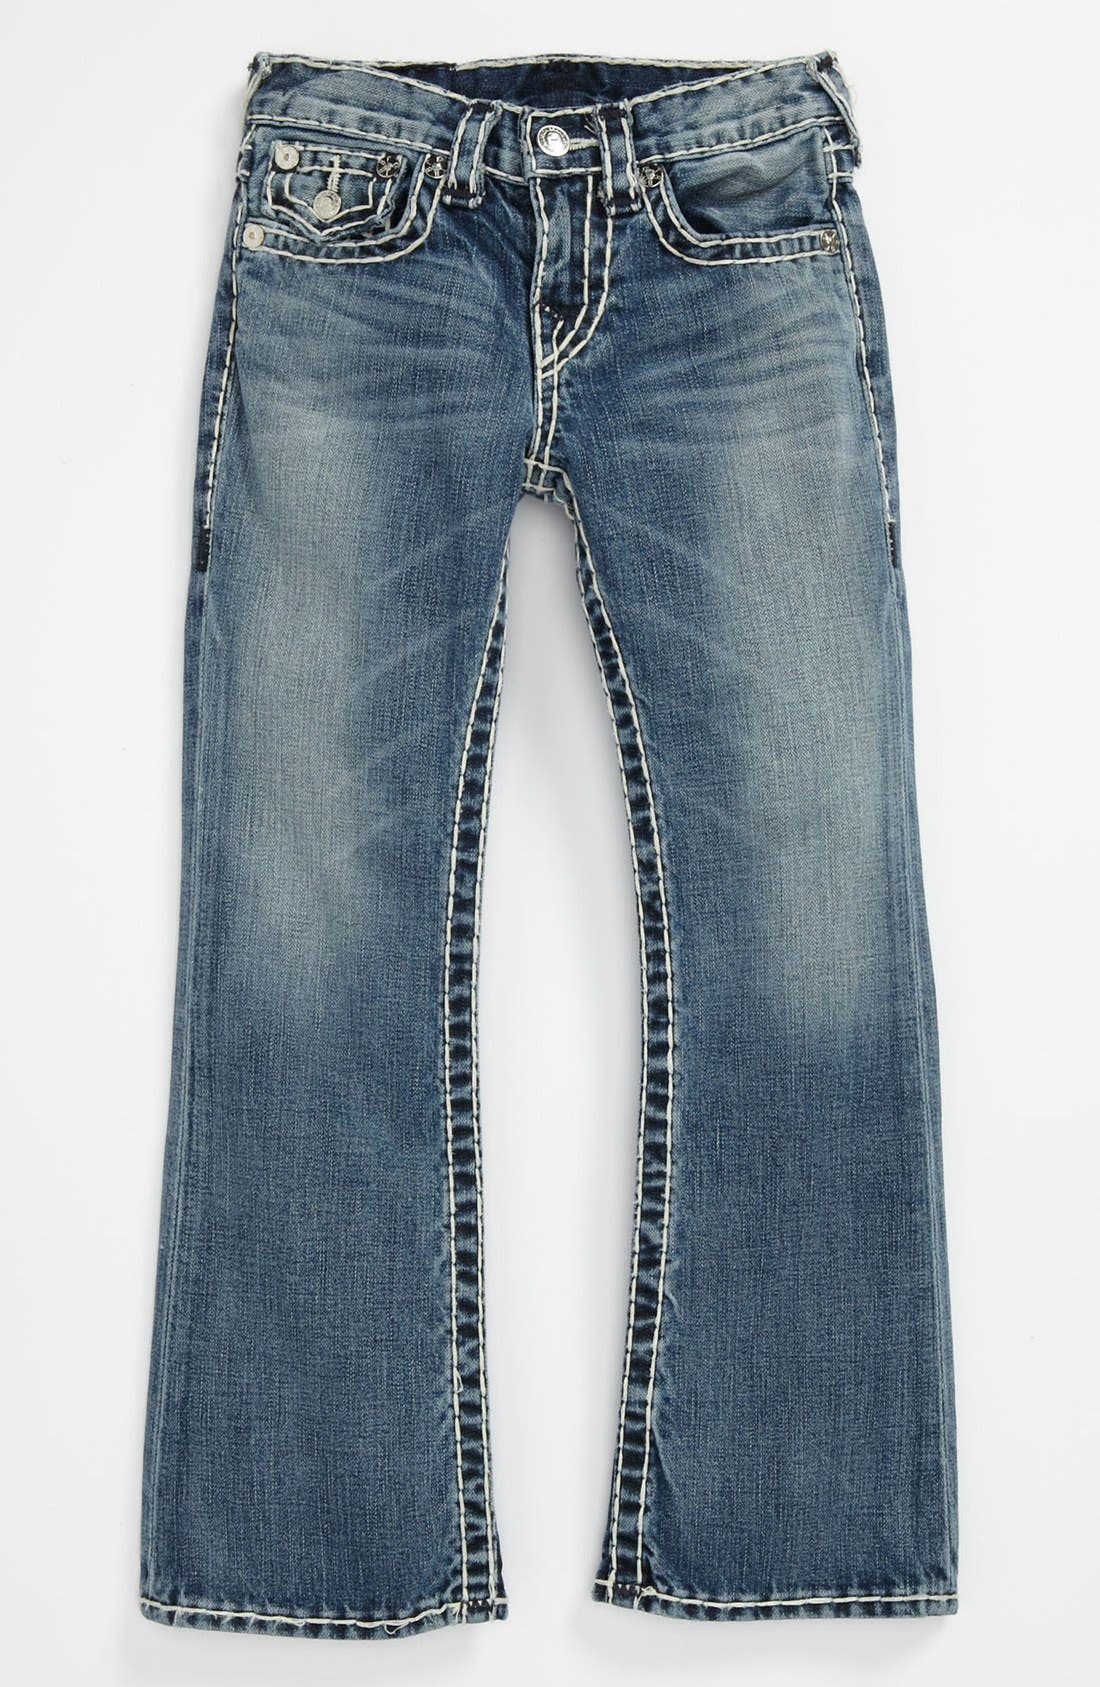 Alternate Image 2  - True Religion Brand Jeans 'Billy Super T' Jeans (Little Boys)